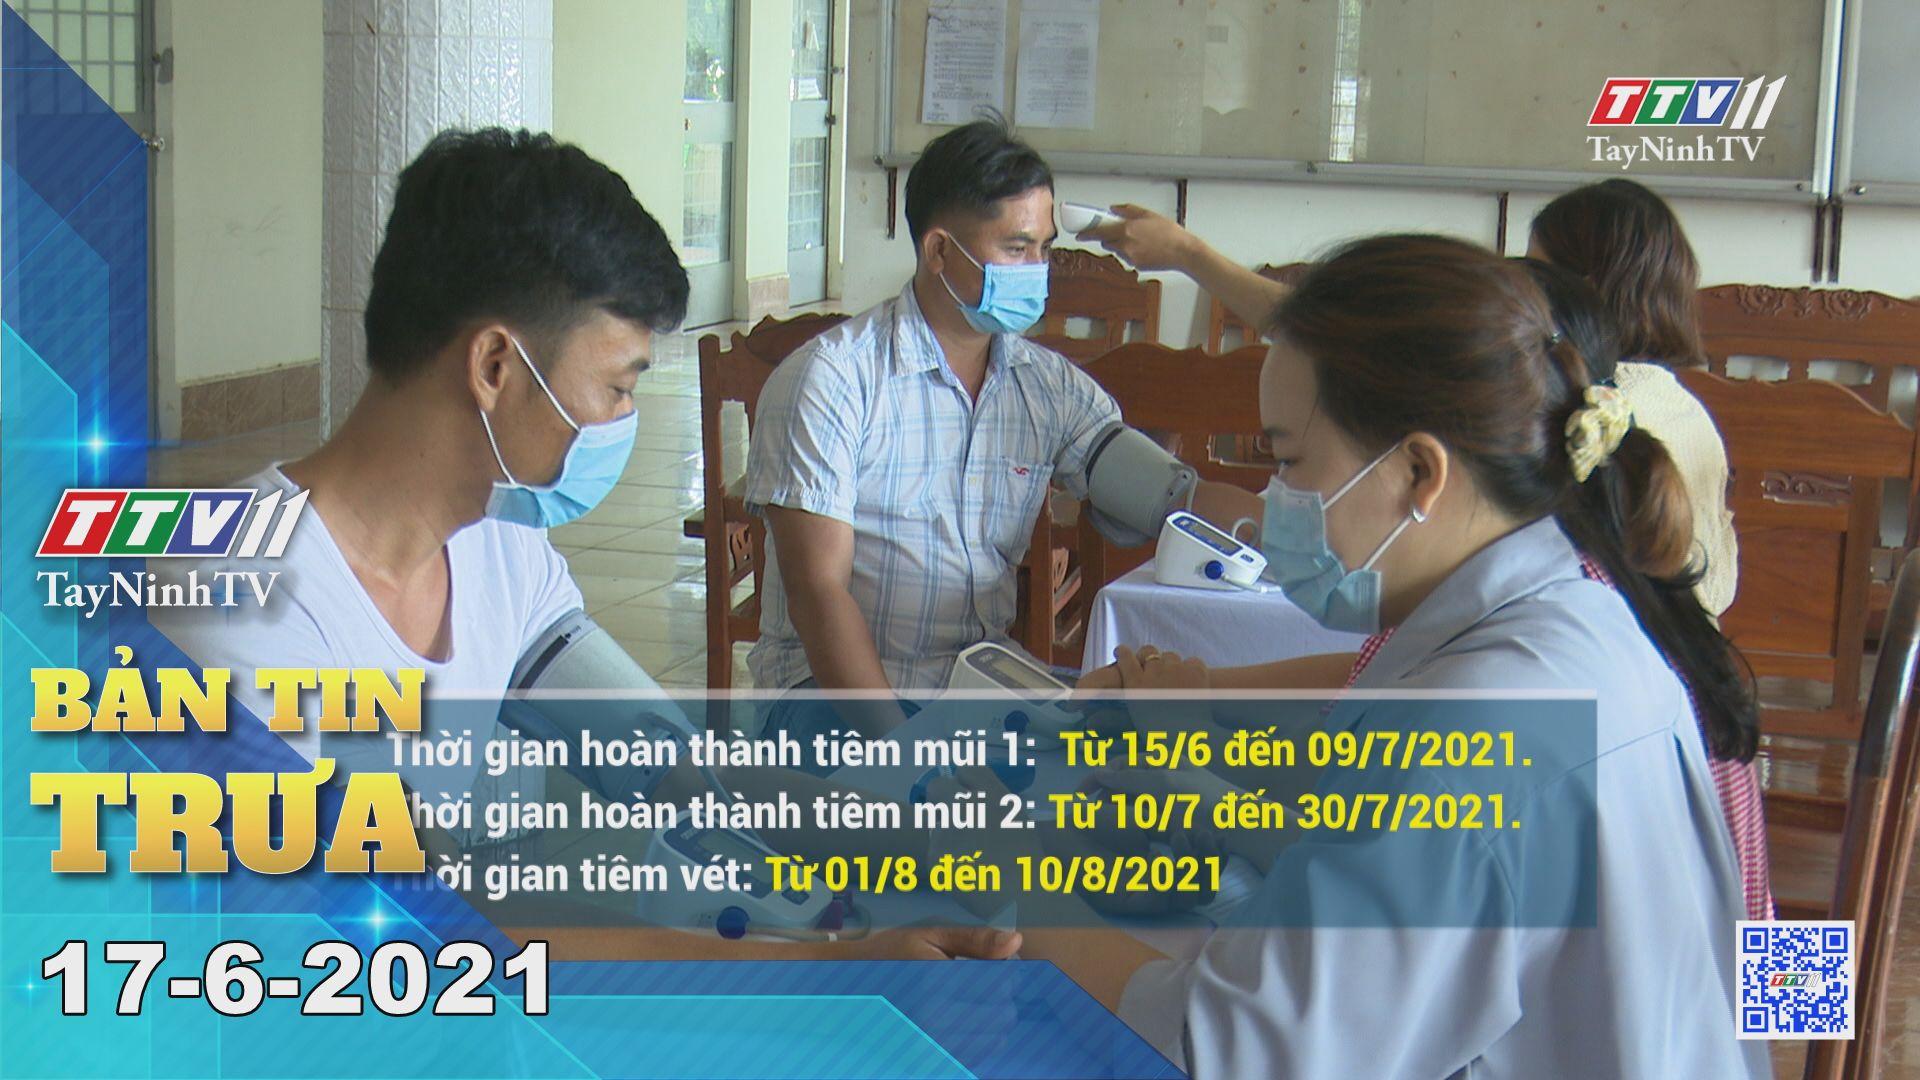 Bản tin trưa 17-6-2021 | Tin tức hôm nay | TayNinhTV